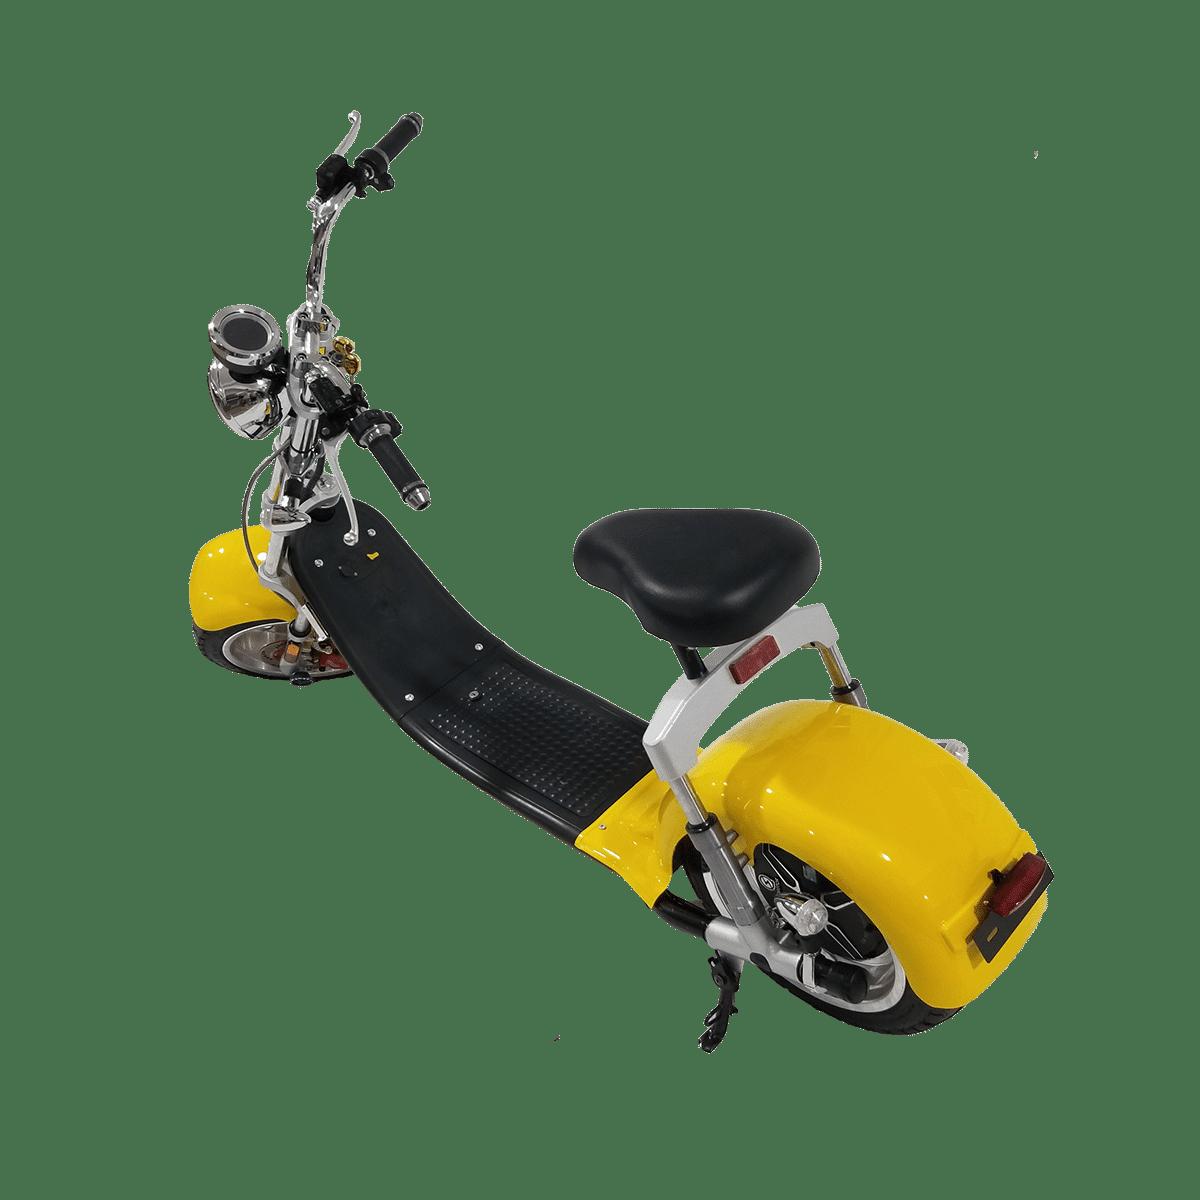 Citycoco Harley Deluxe Jaune avec 1 batterie offerte en plus 27